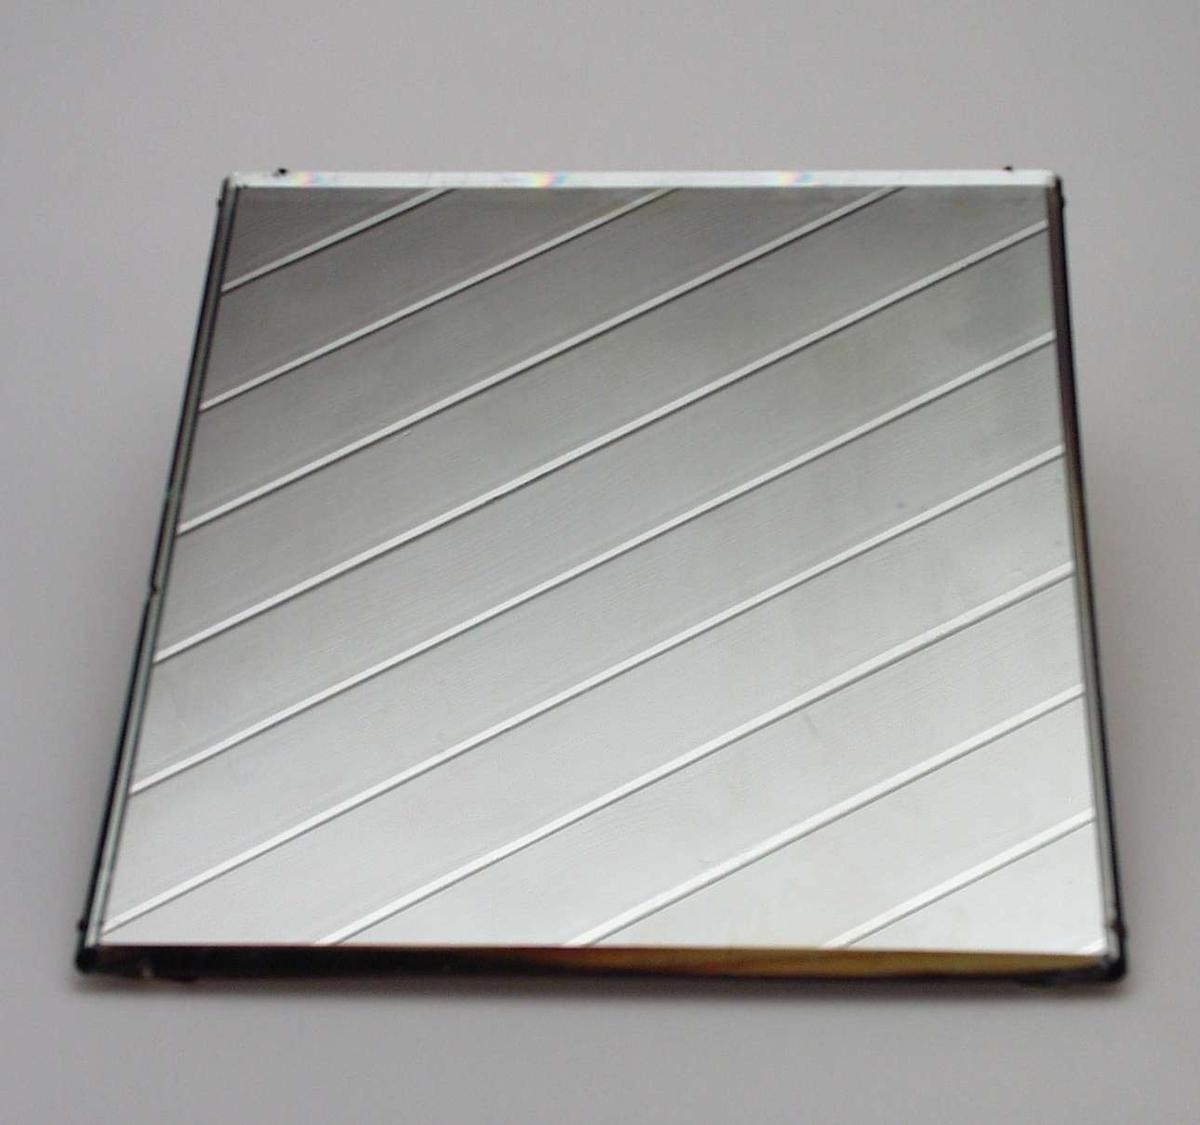 Firkantet speil med bakstykke i tre. Ingen innramming.